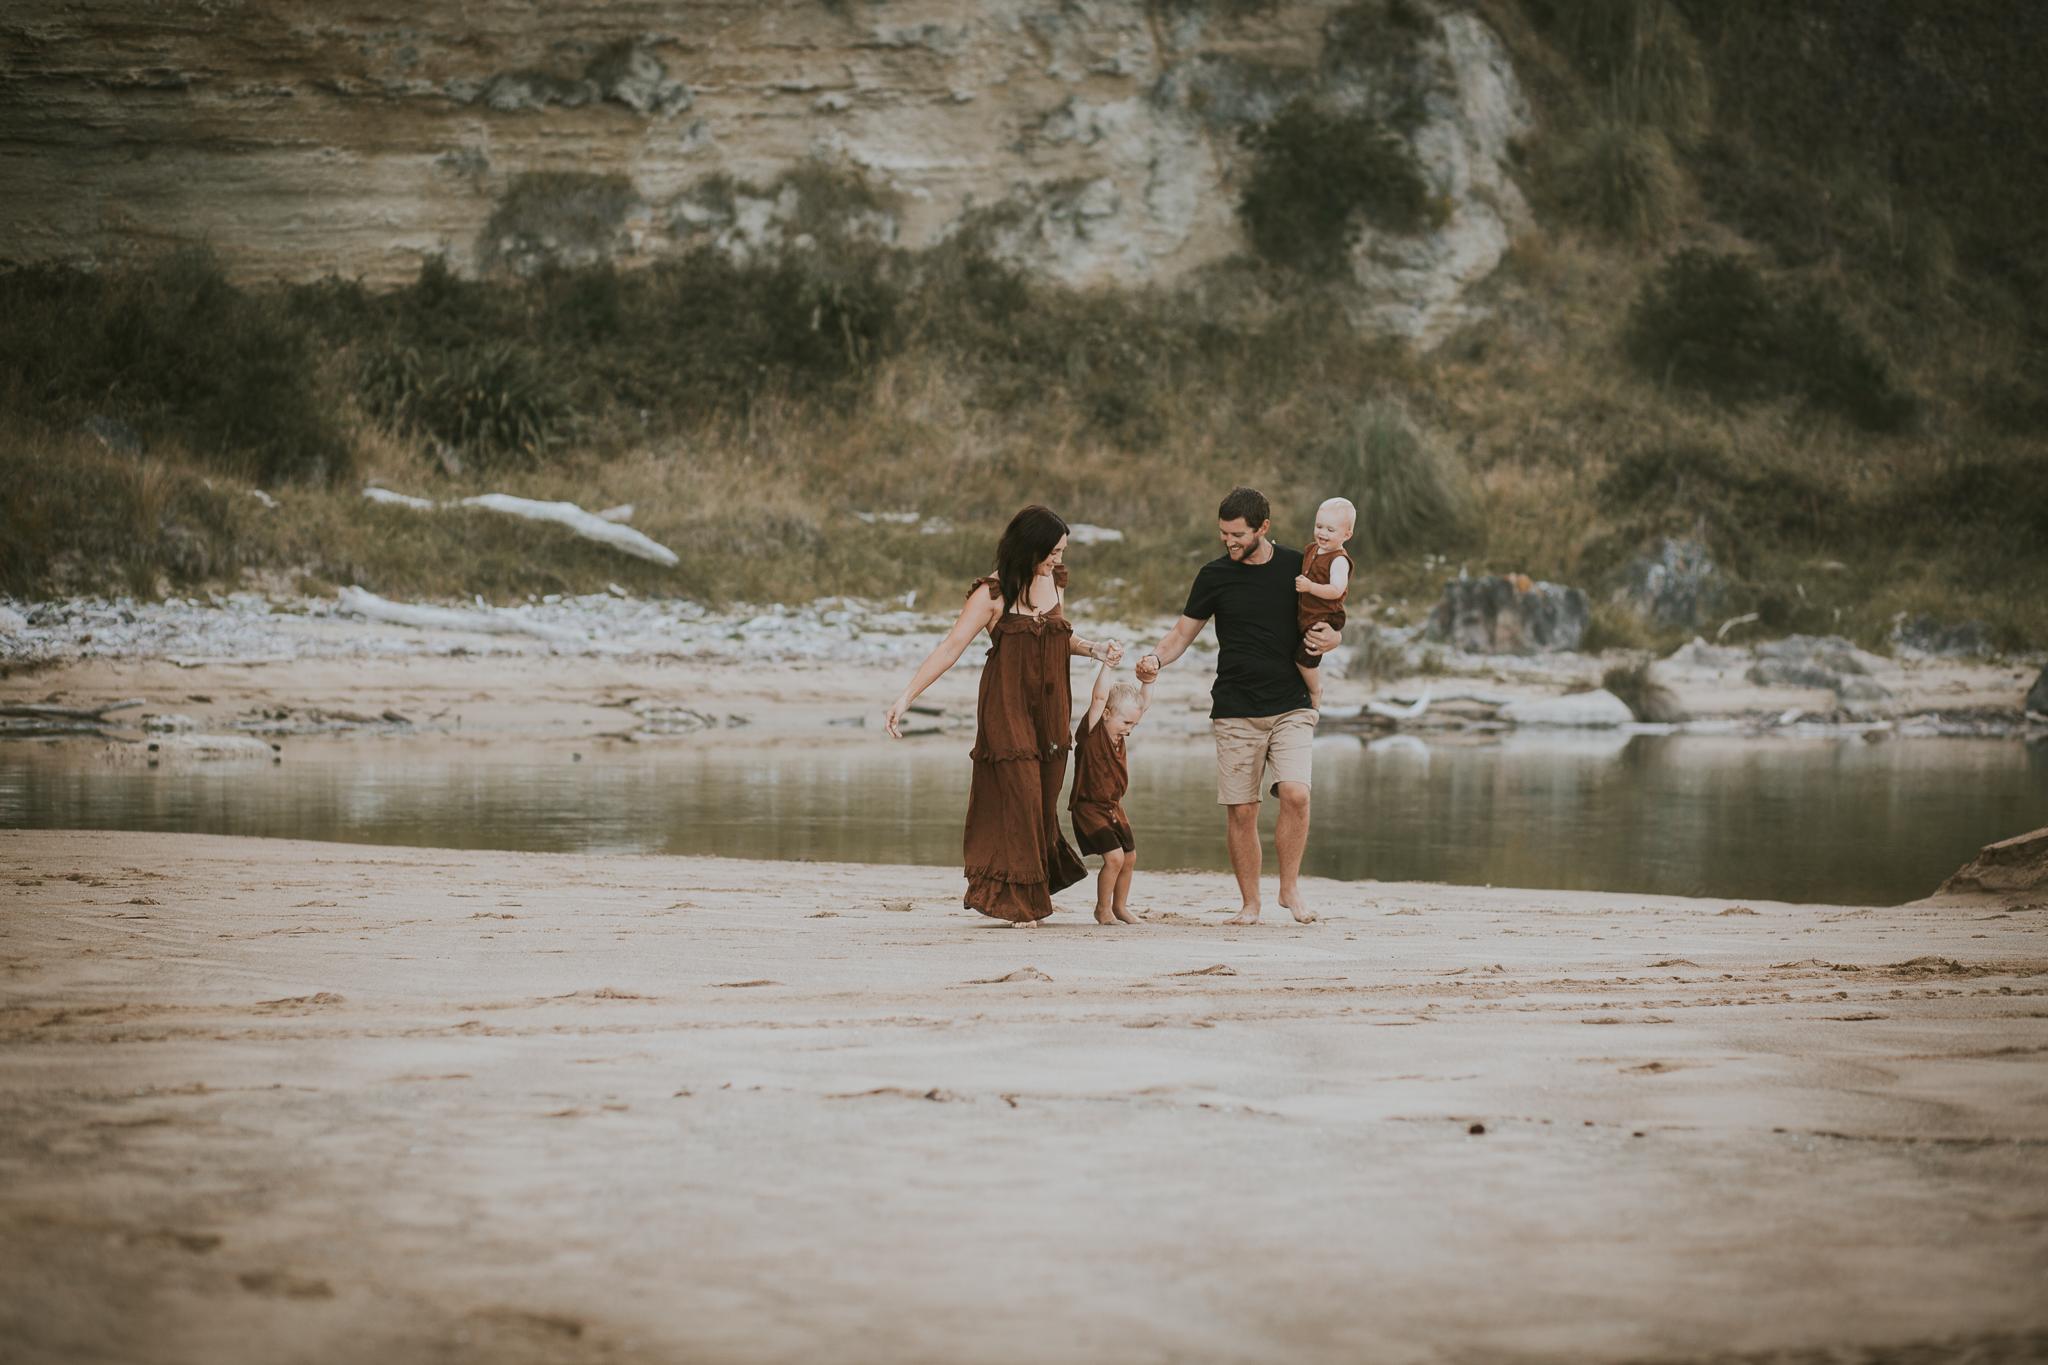 Nz Hawkes Bay Napier Wedding photographer waipatiki beach-71.jpg